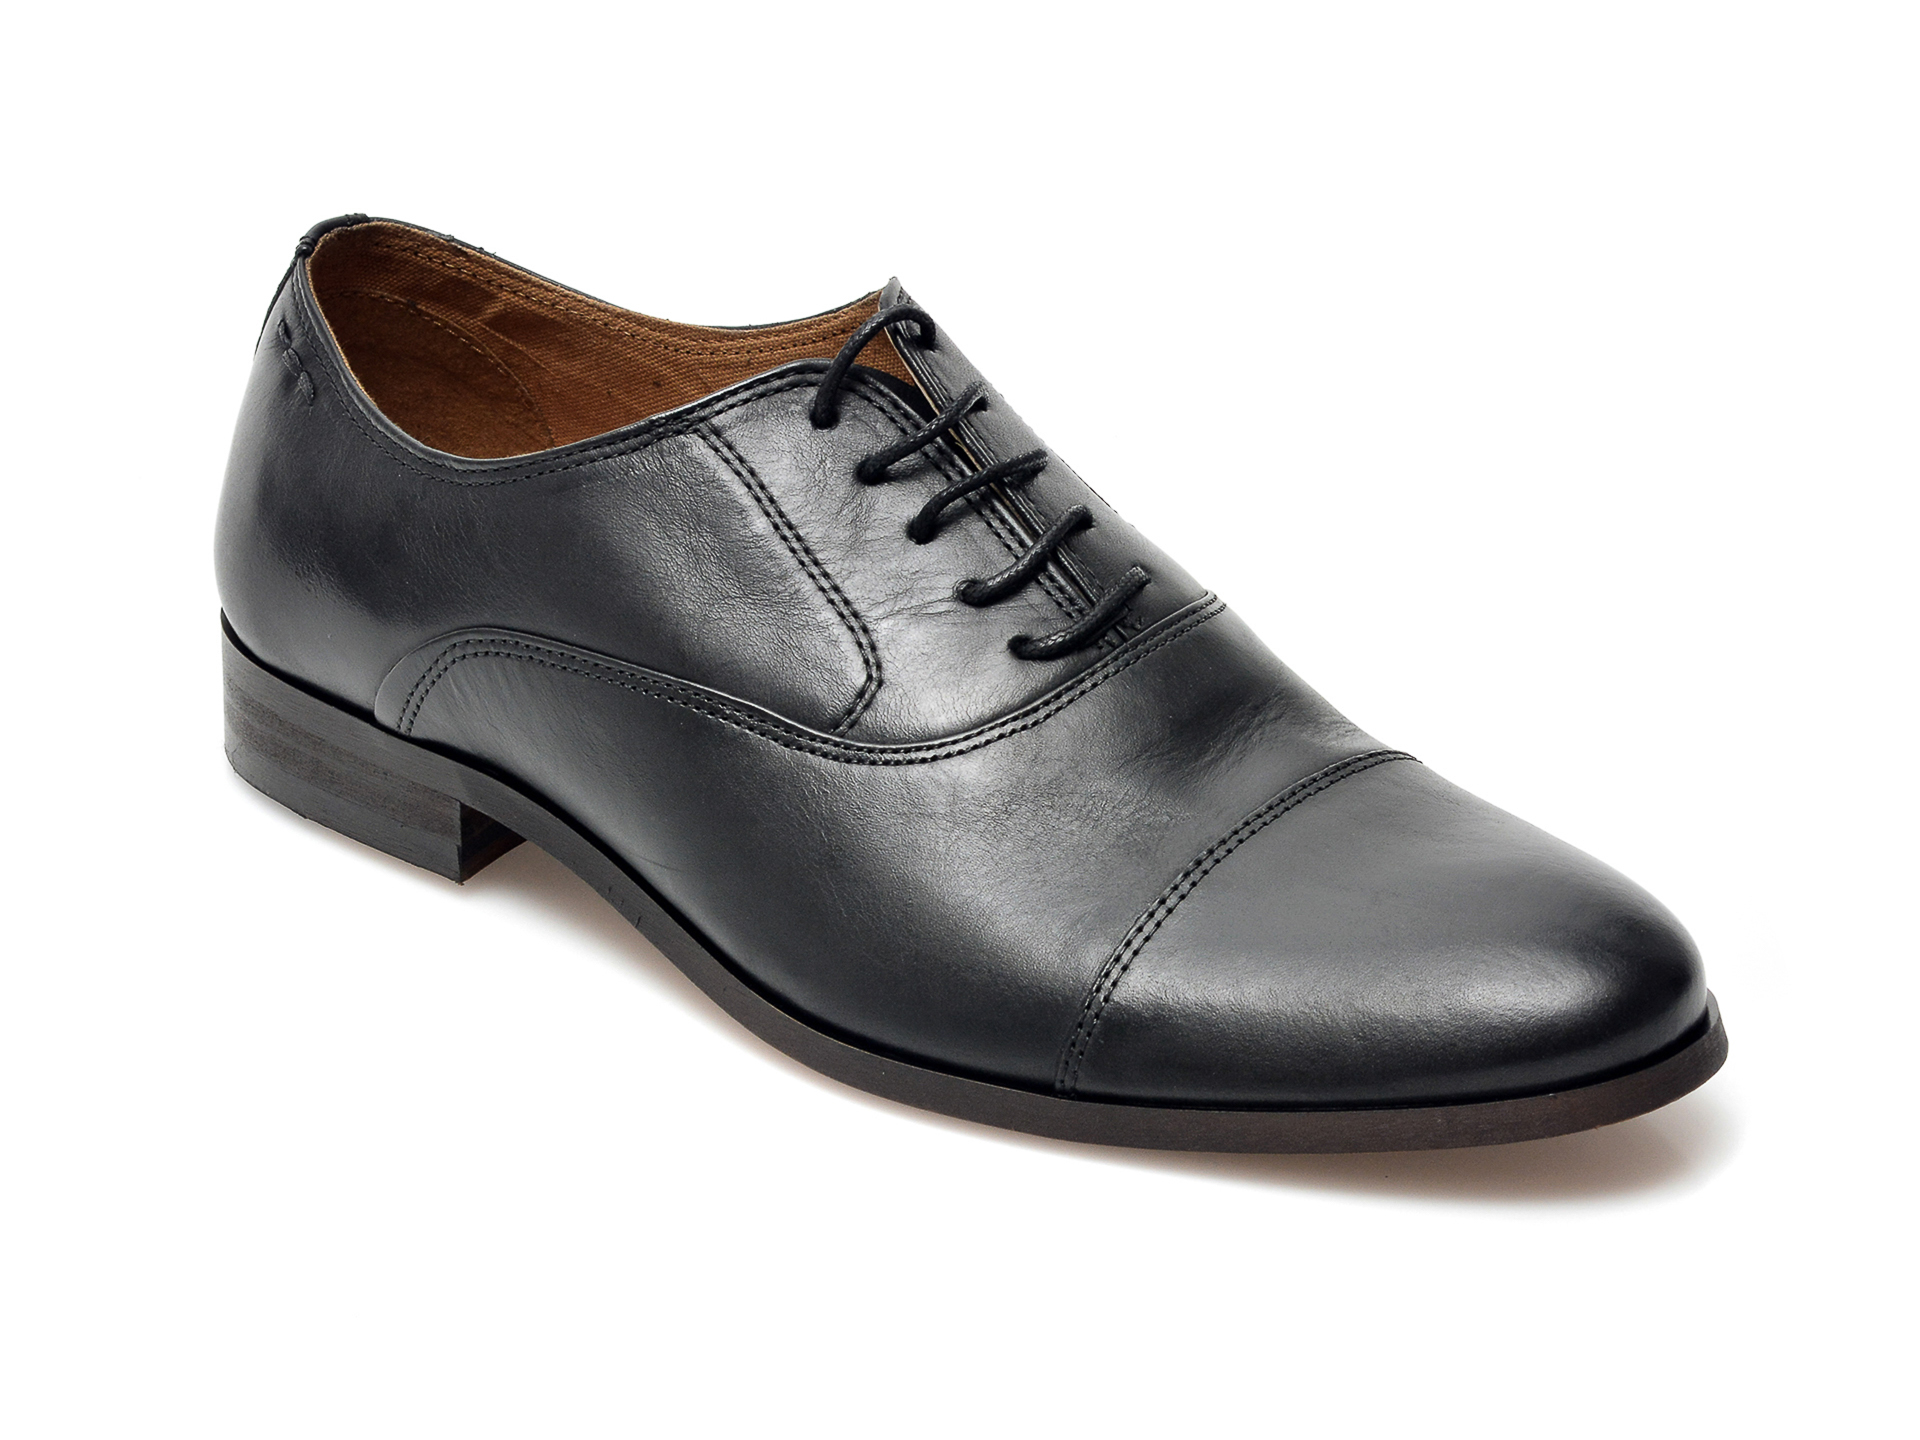 Pantofi ALDO negri, Kirzinger001, din piele naturala imagine otter.ro 2021